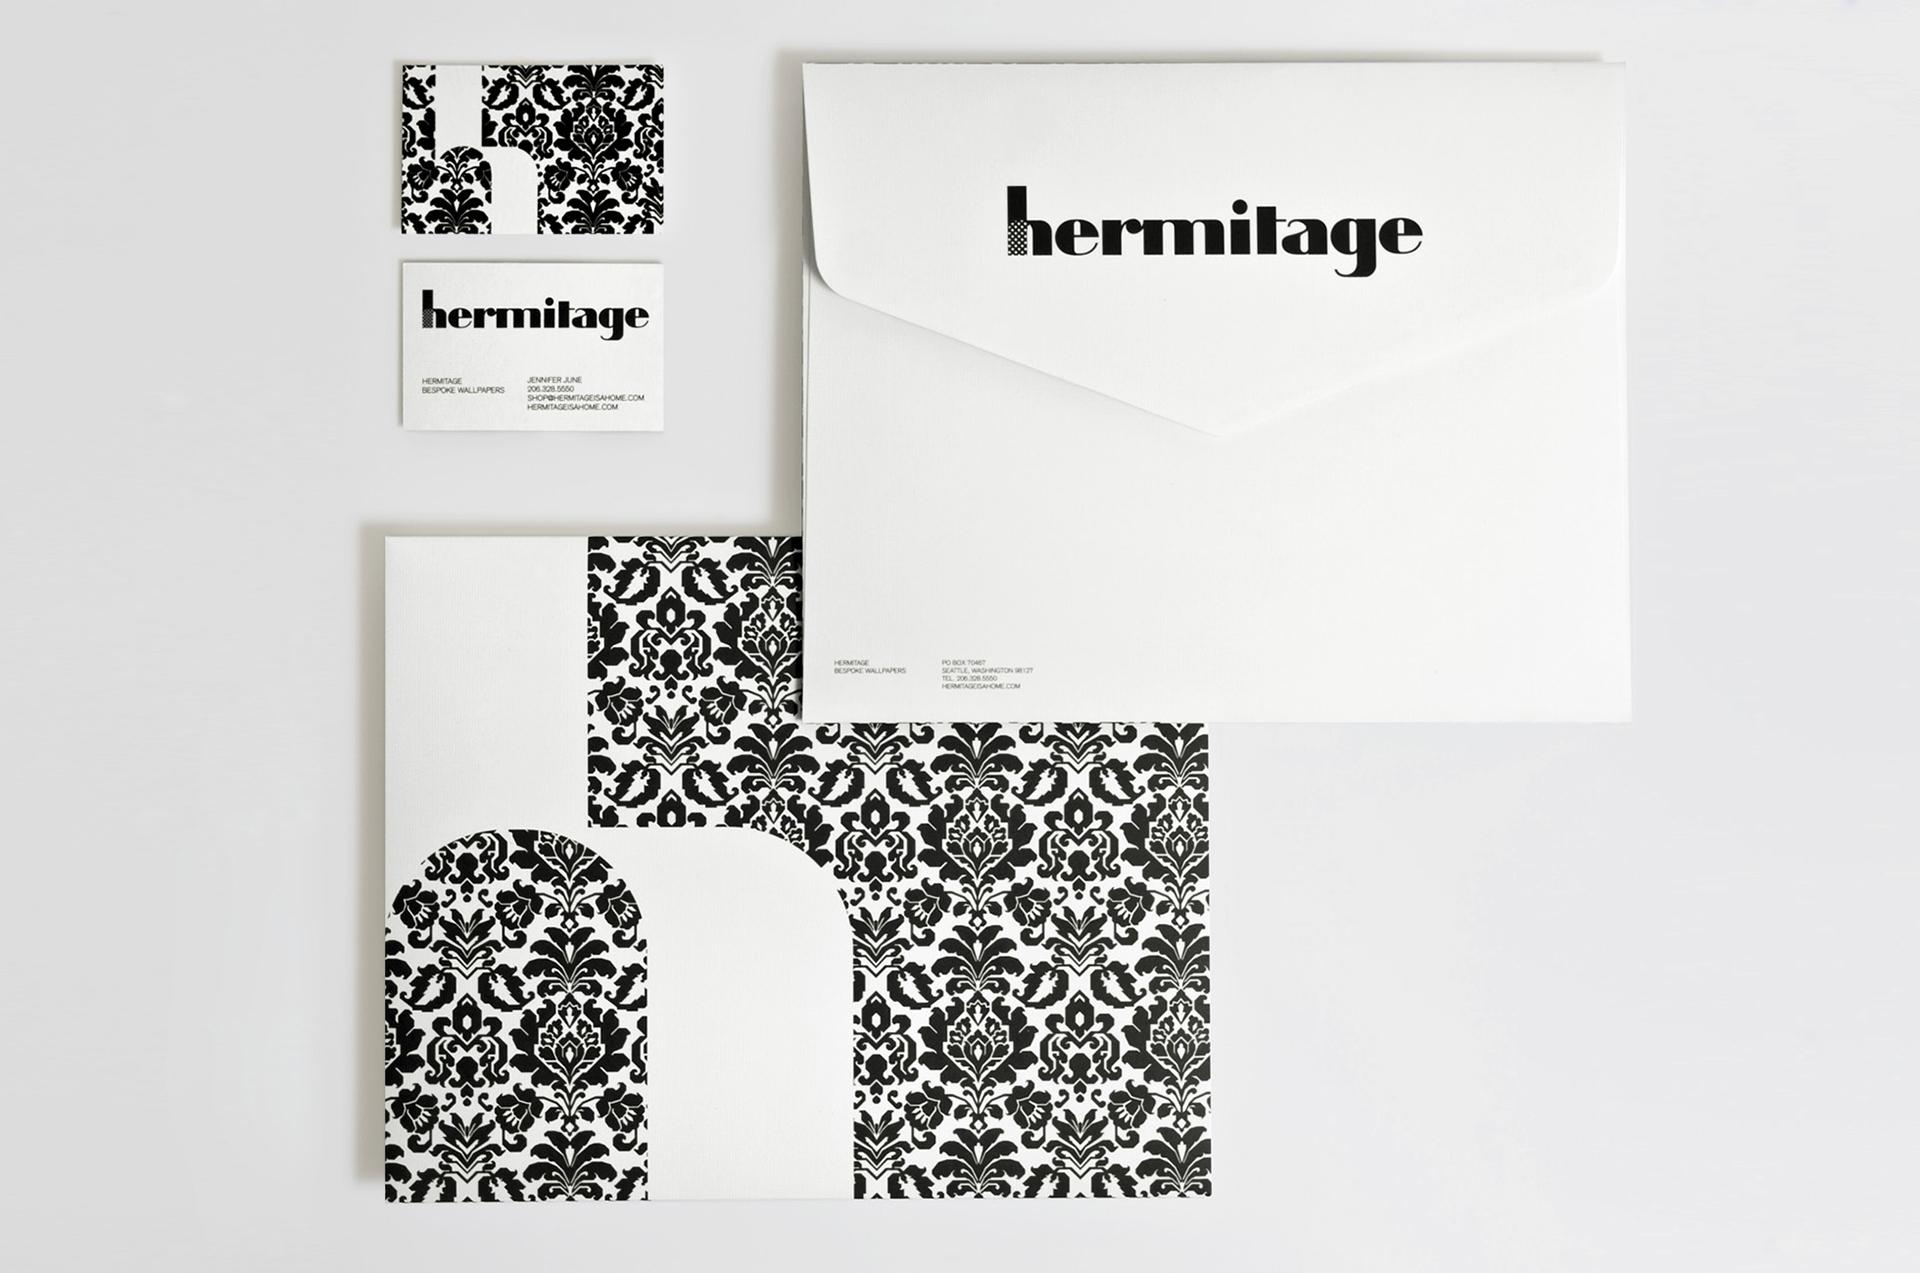 Hermitage Brand Identity Spotlight